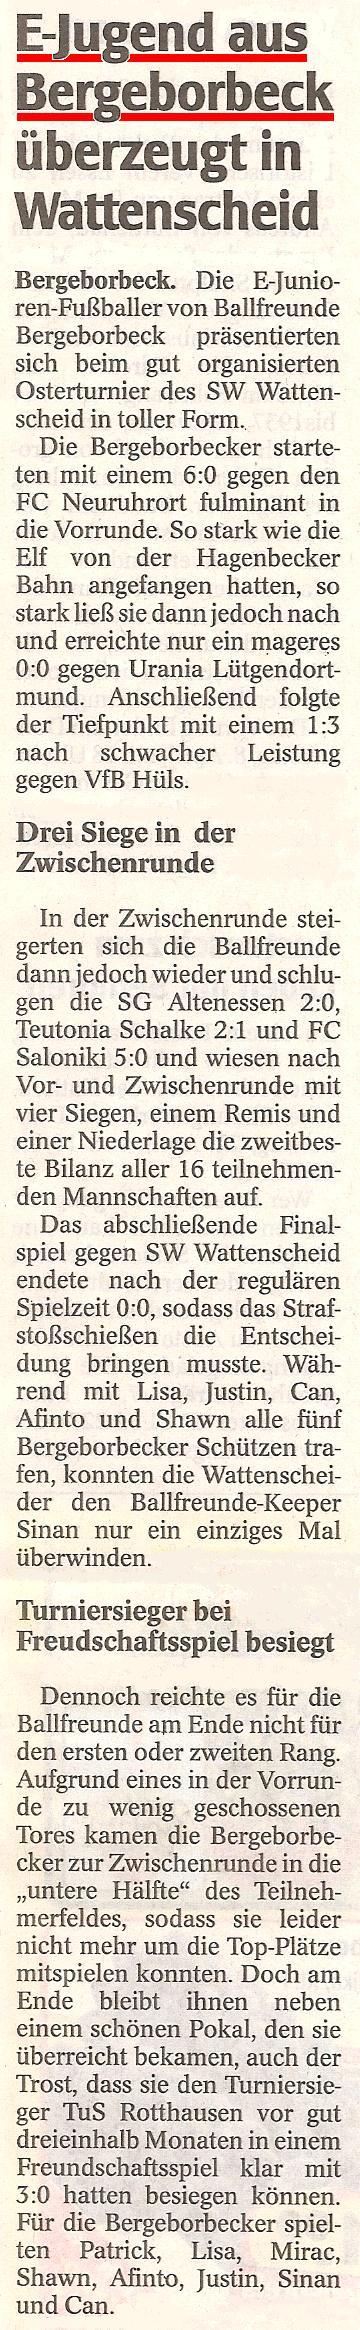 WAZ berichtet über Ballfreunde E1 Turnier am Ostersamstag 2010